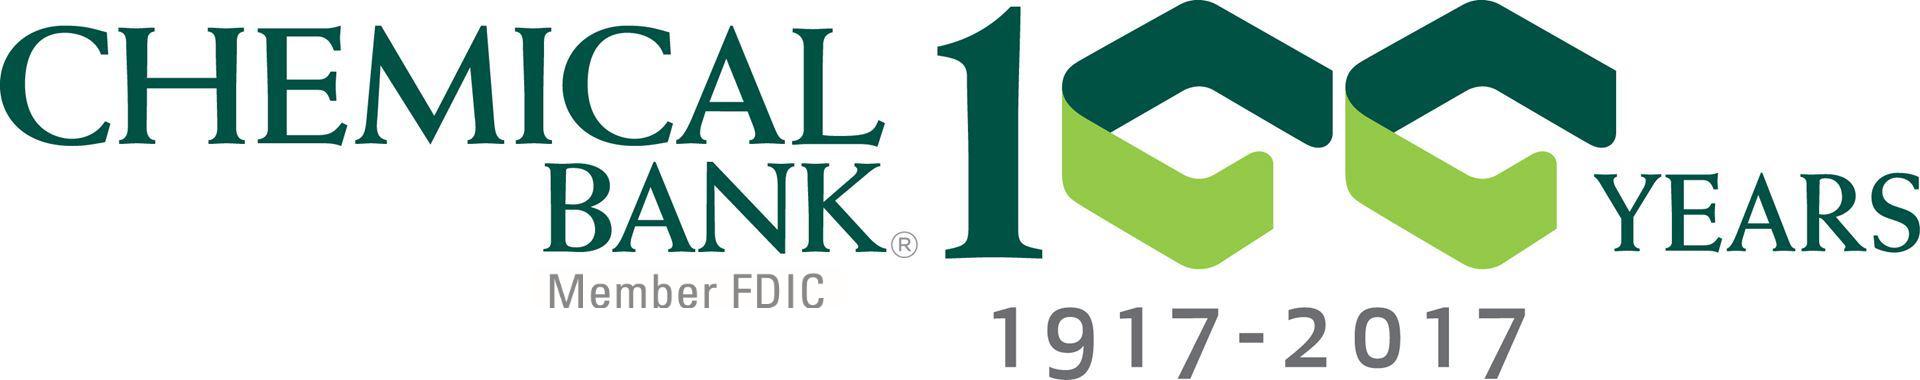 ChemicalBank-No-Member-FDIC_Logo100YearMIXED.png